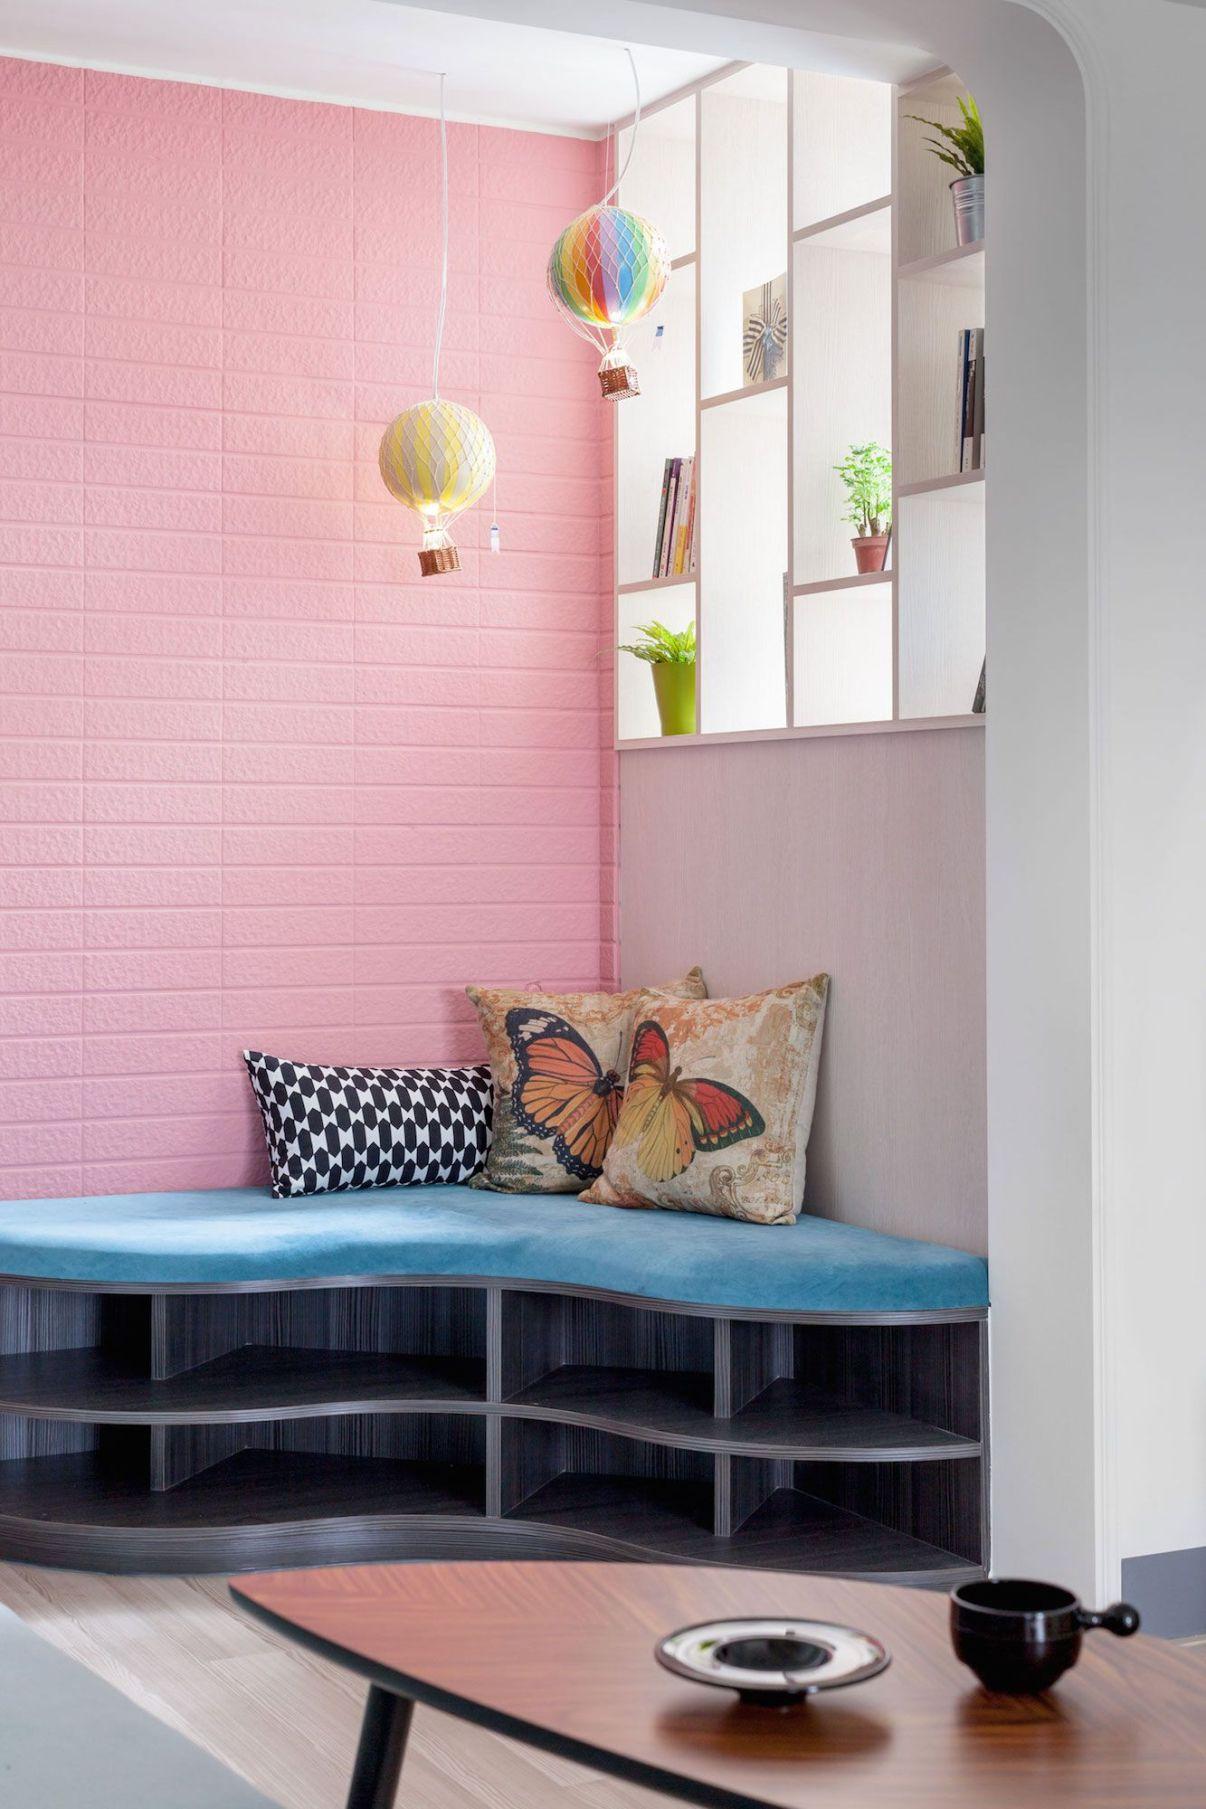 wonderland-apartment-by-house-design-studio-2.jpg